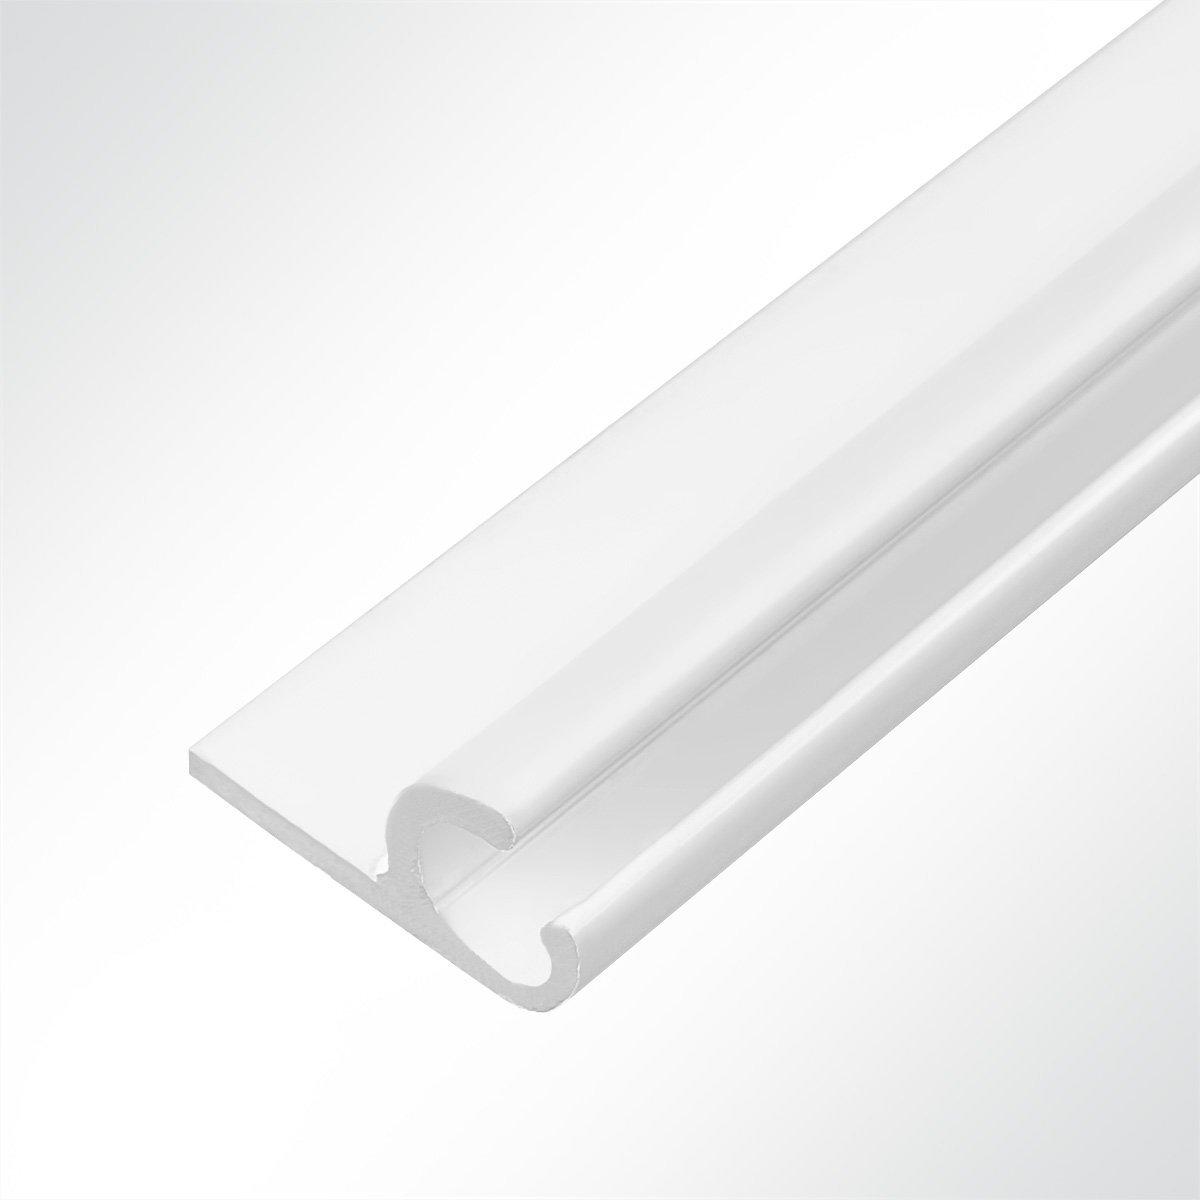 LYSEL Rail de Suspension en Aluminium Blanc 15 x 30 mm